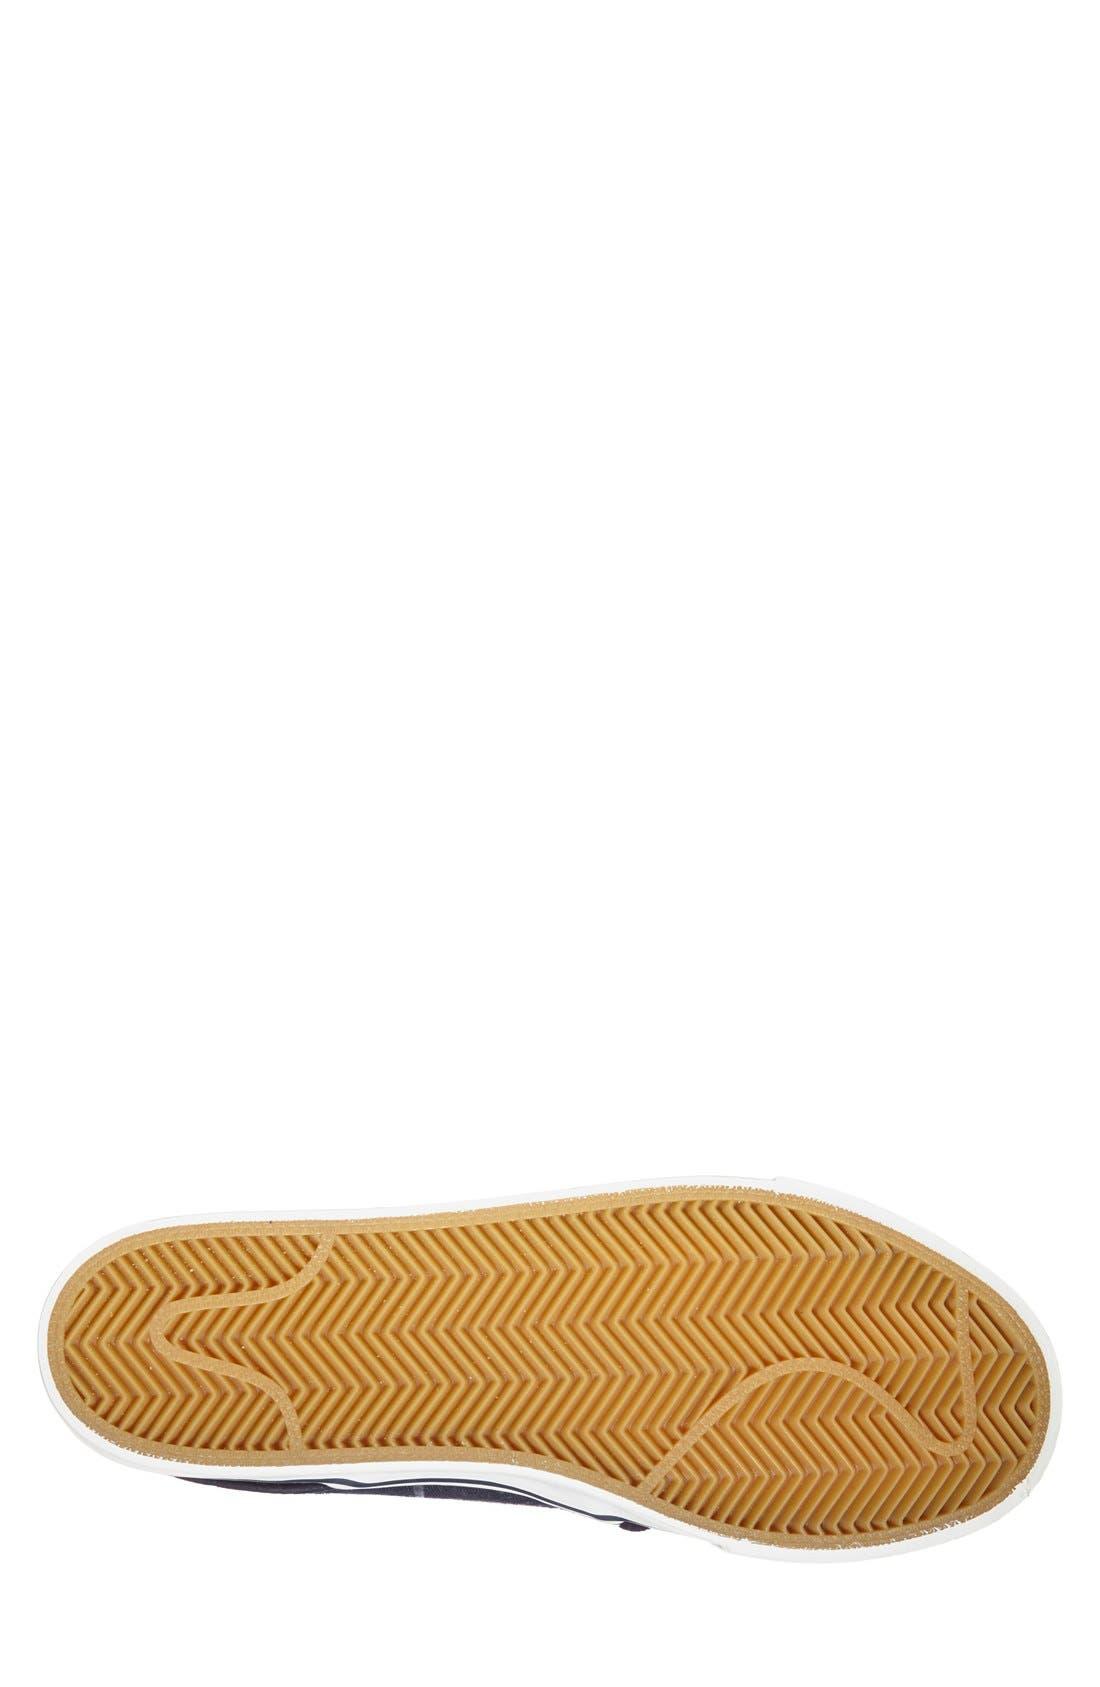 Zoom - Stefan Janoski SB Canvas Skate Shoe,                             Alternate thumbnail 163, color,